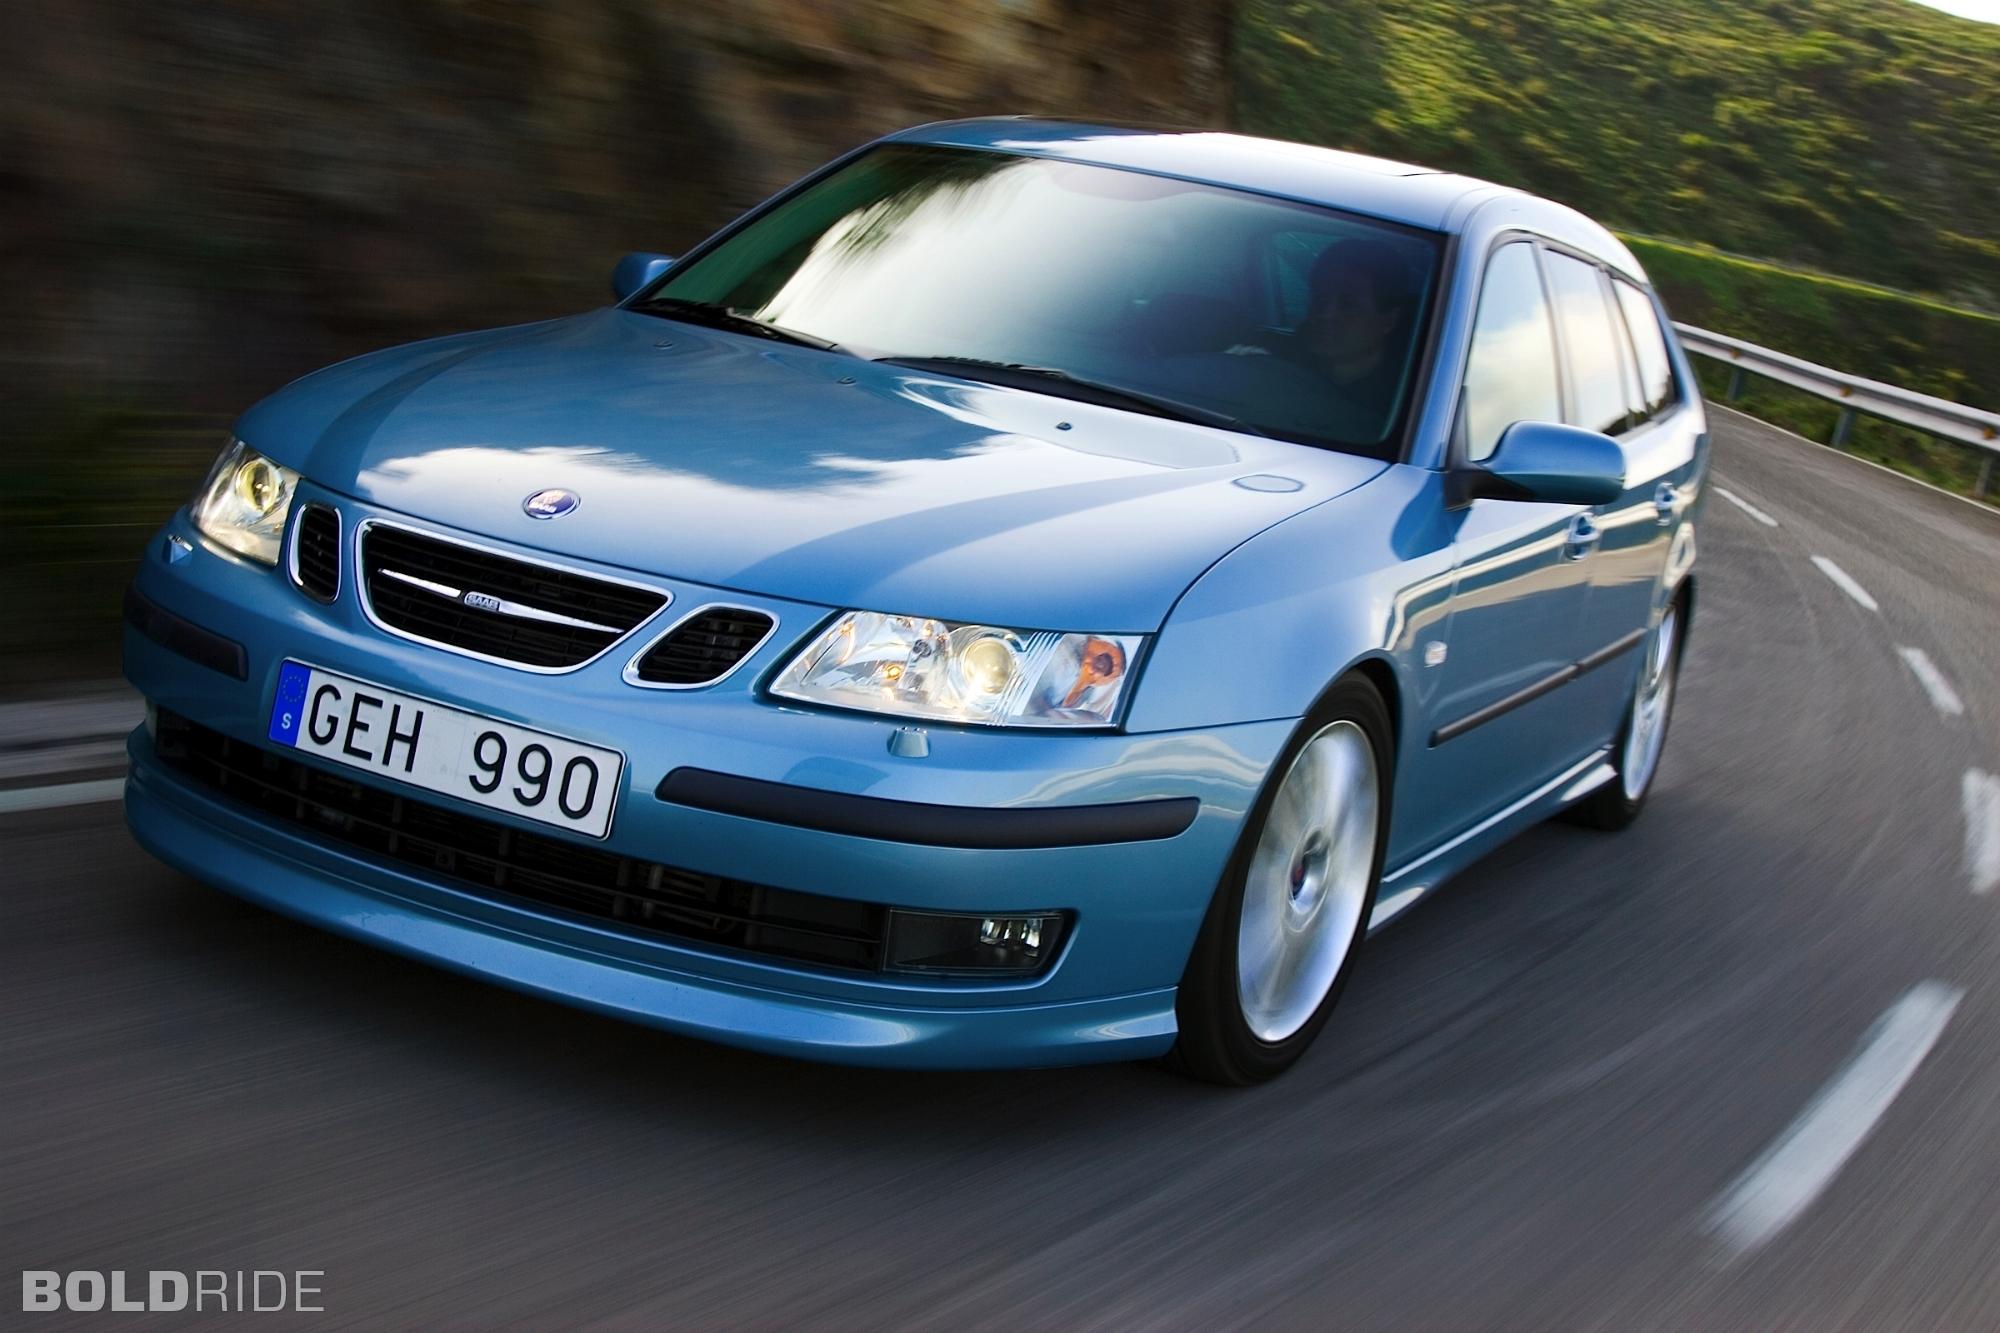 Saab 9 3 hatchback i